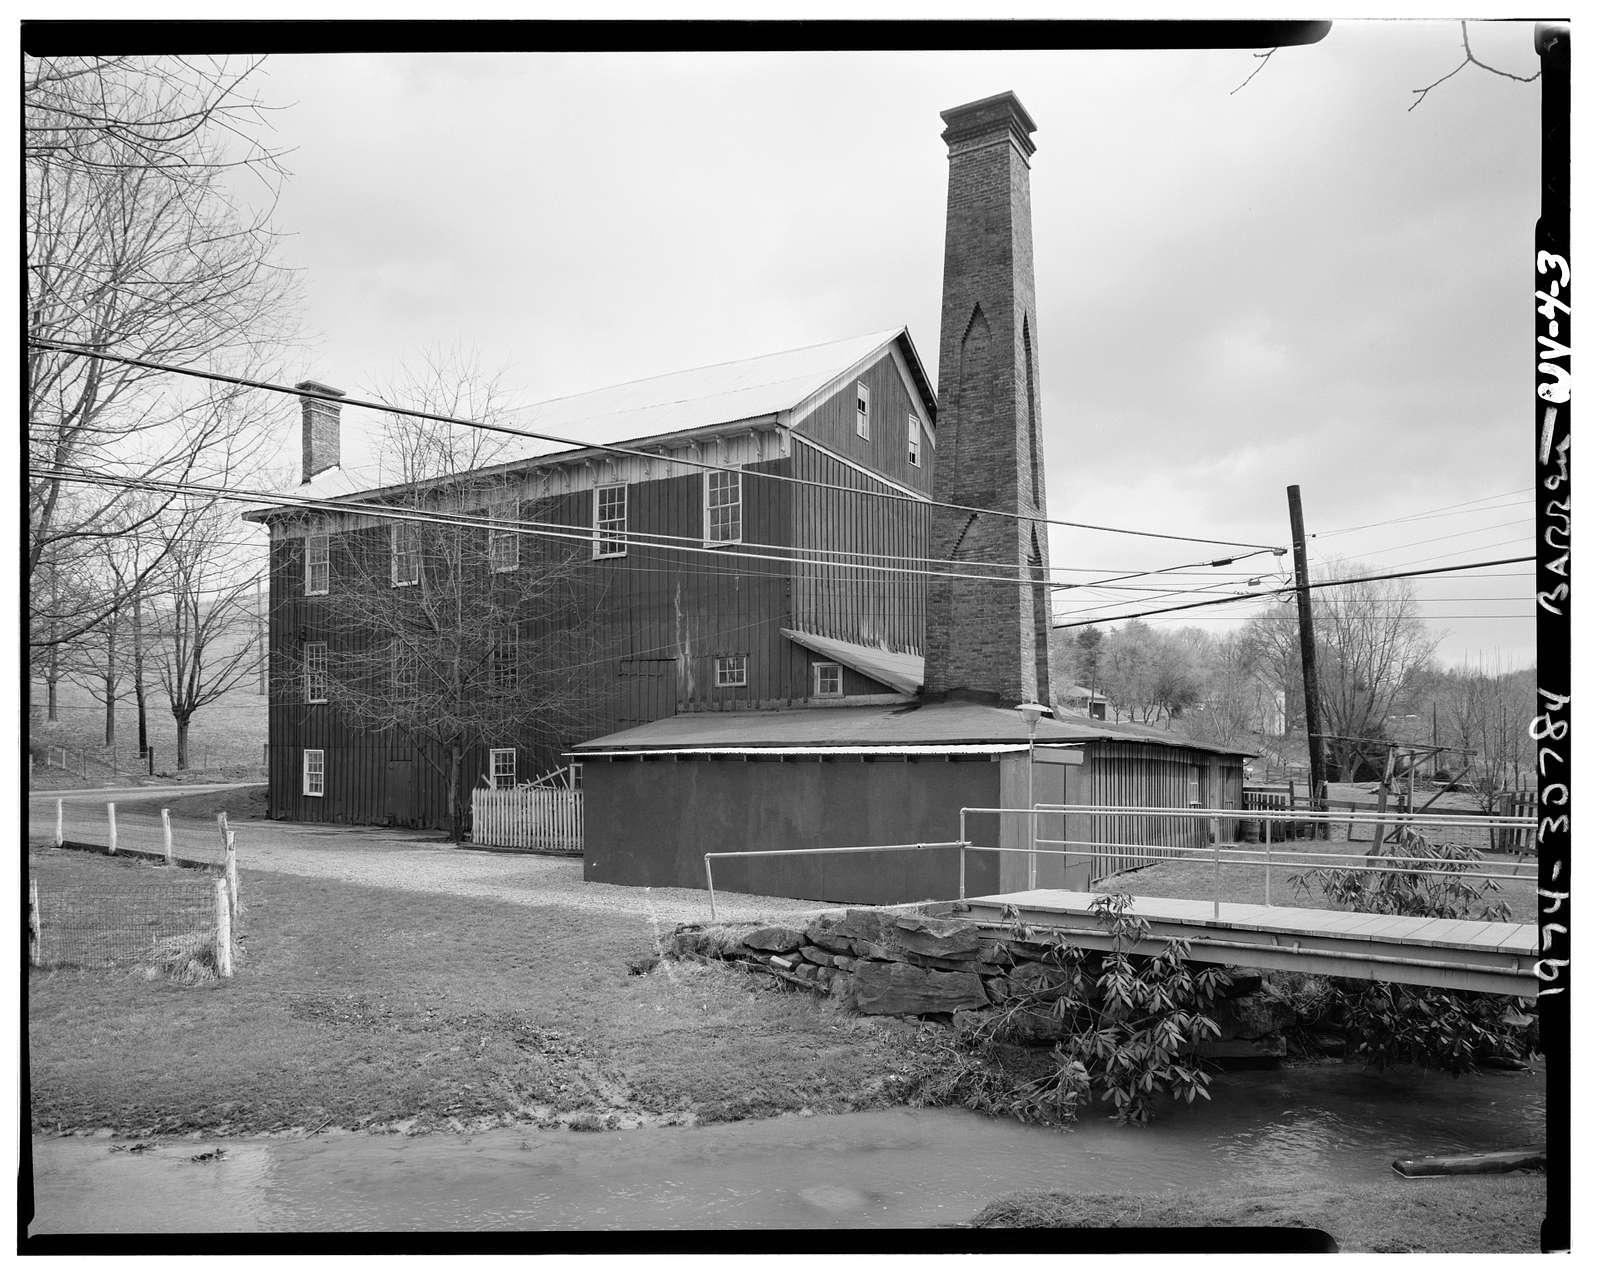 Easton Roller Mill, West Run Road, Morgantown, Monongalia County, WV